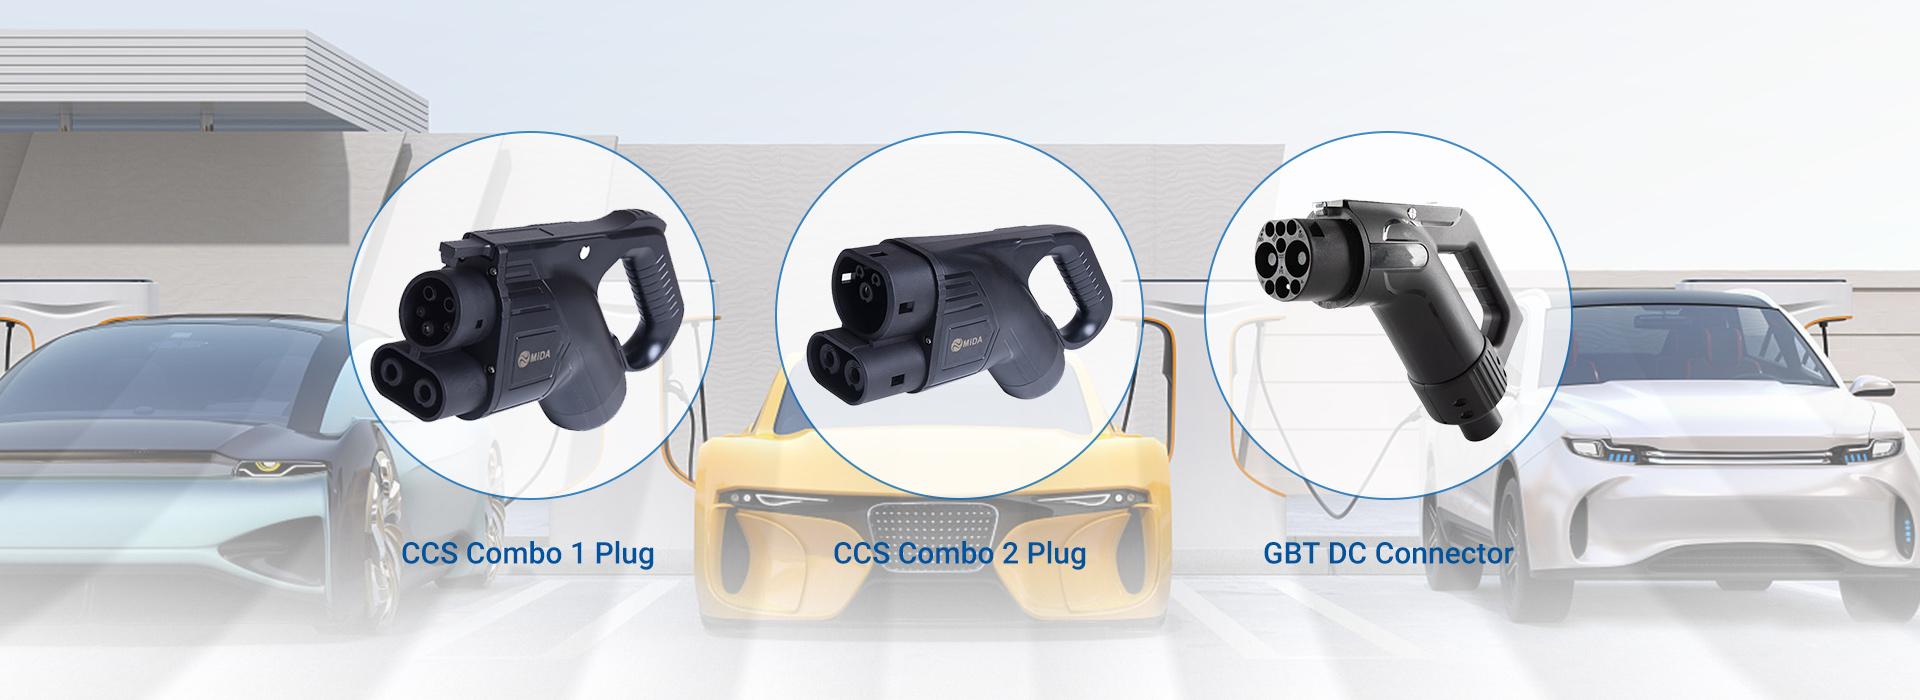 CCS Combo 2 Plug